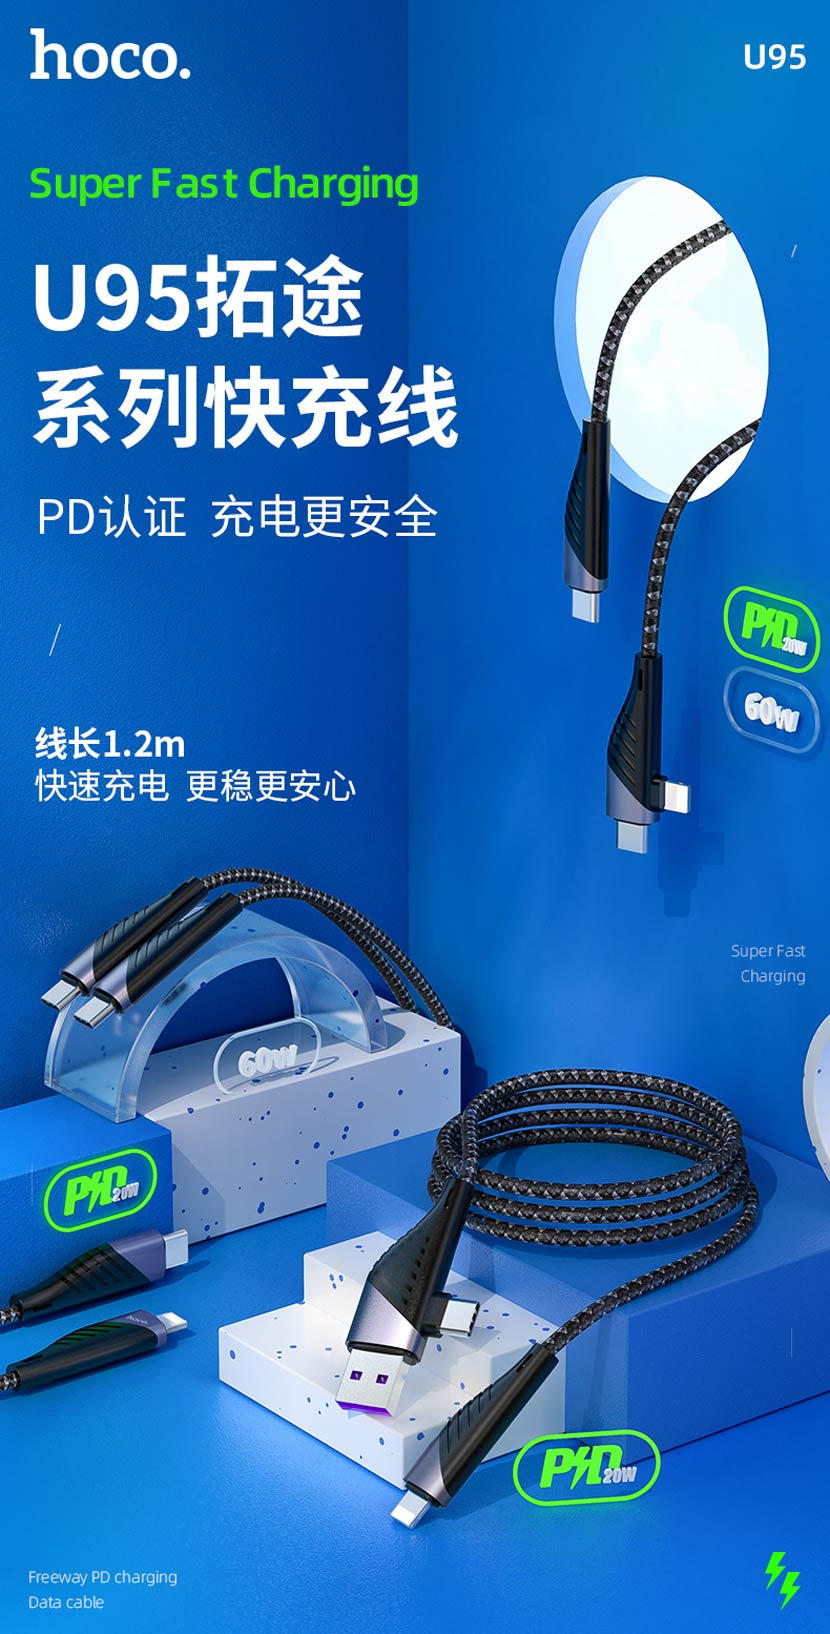 hoco news u95 freeway pd charging data cable cn